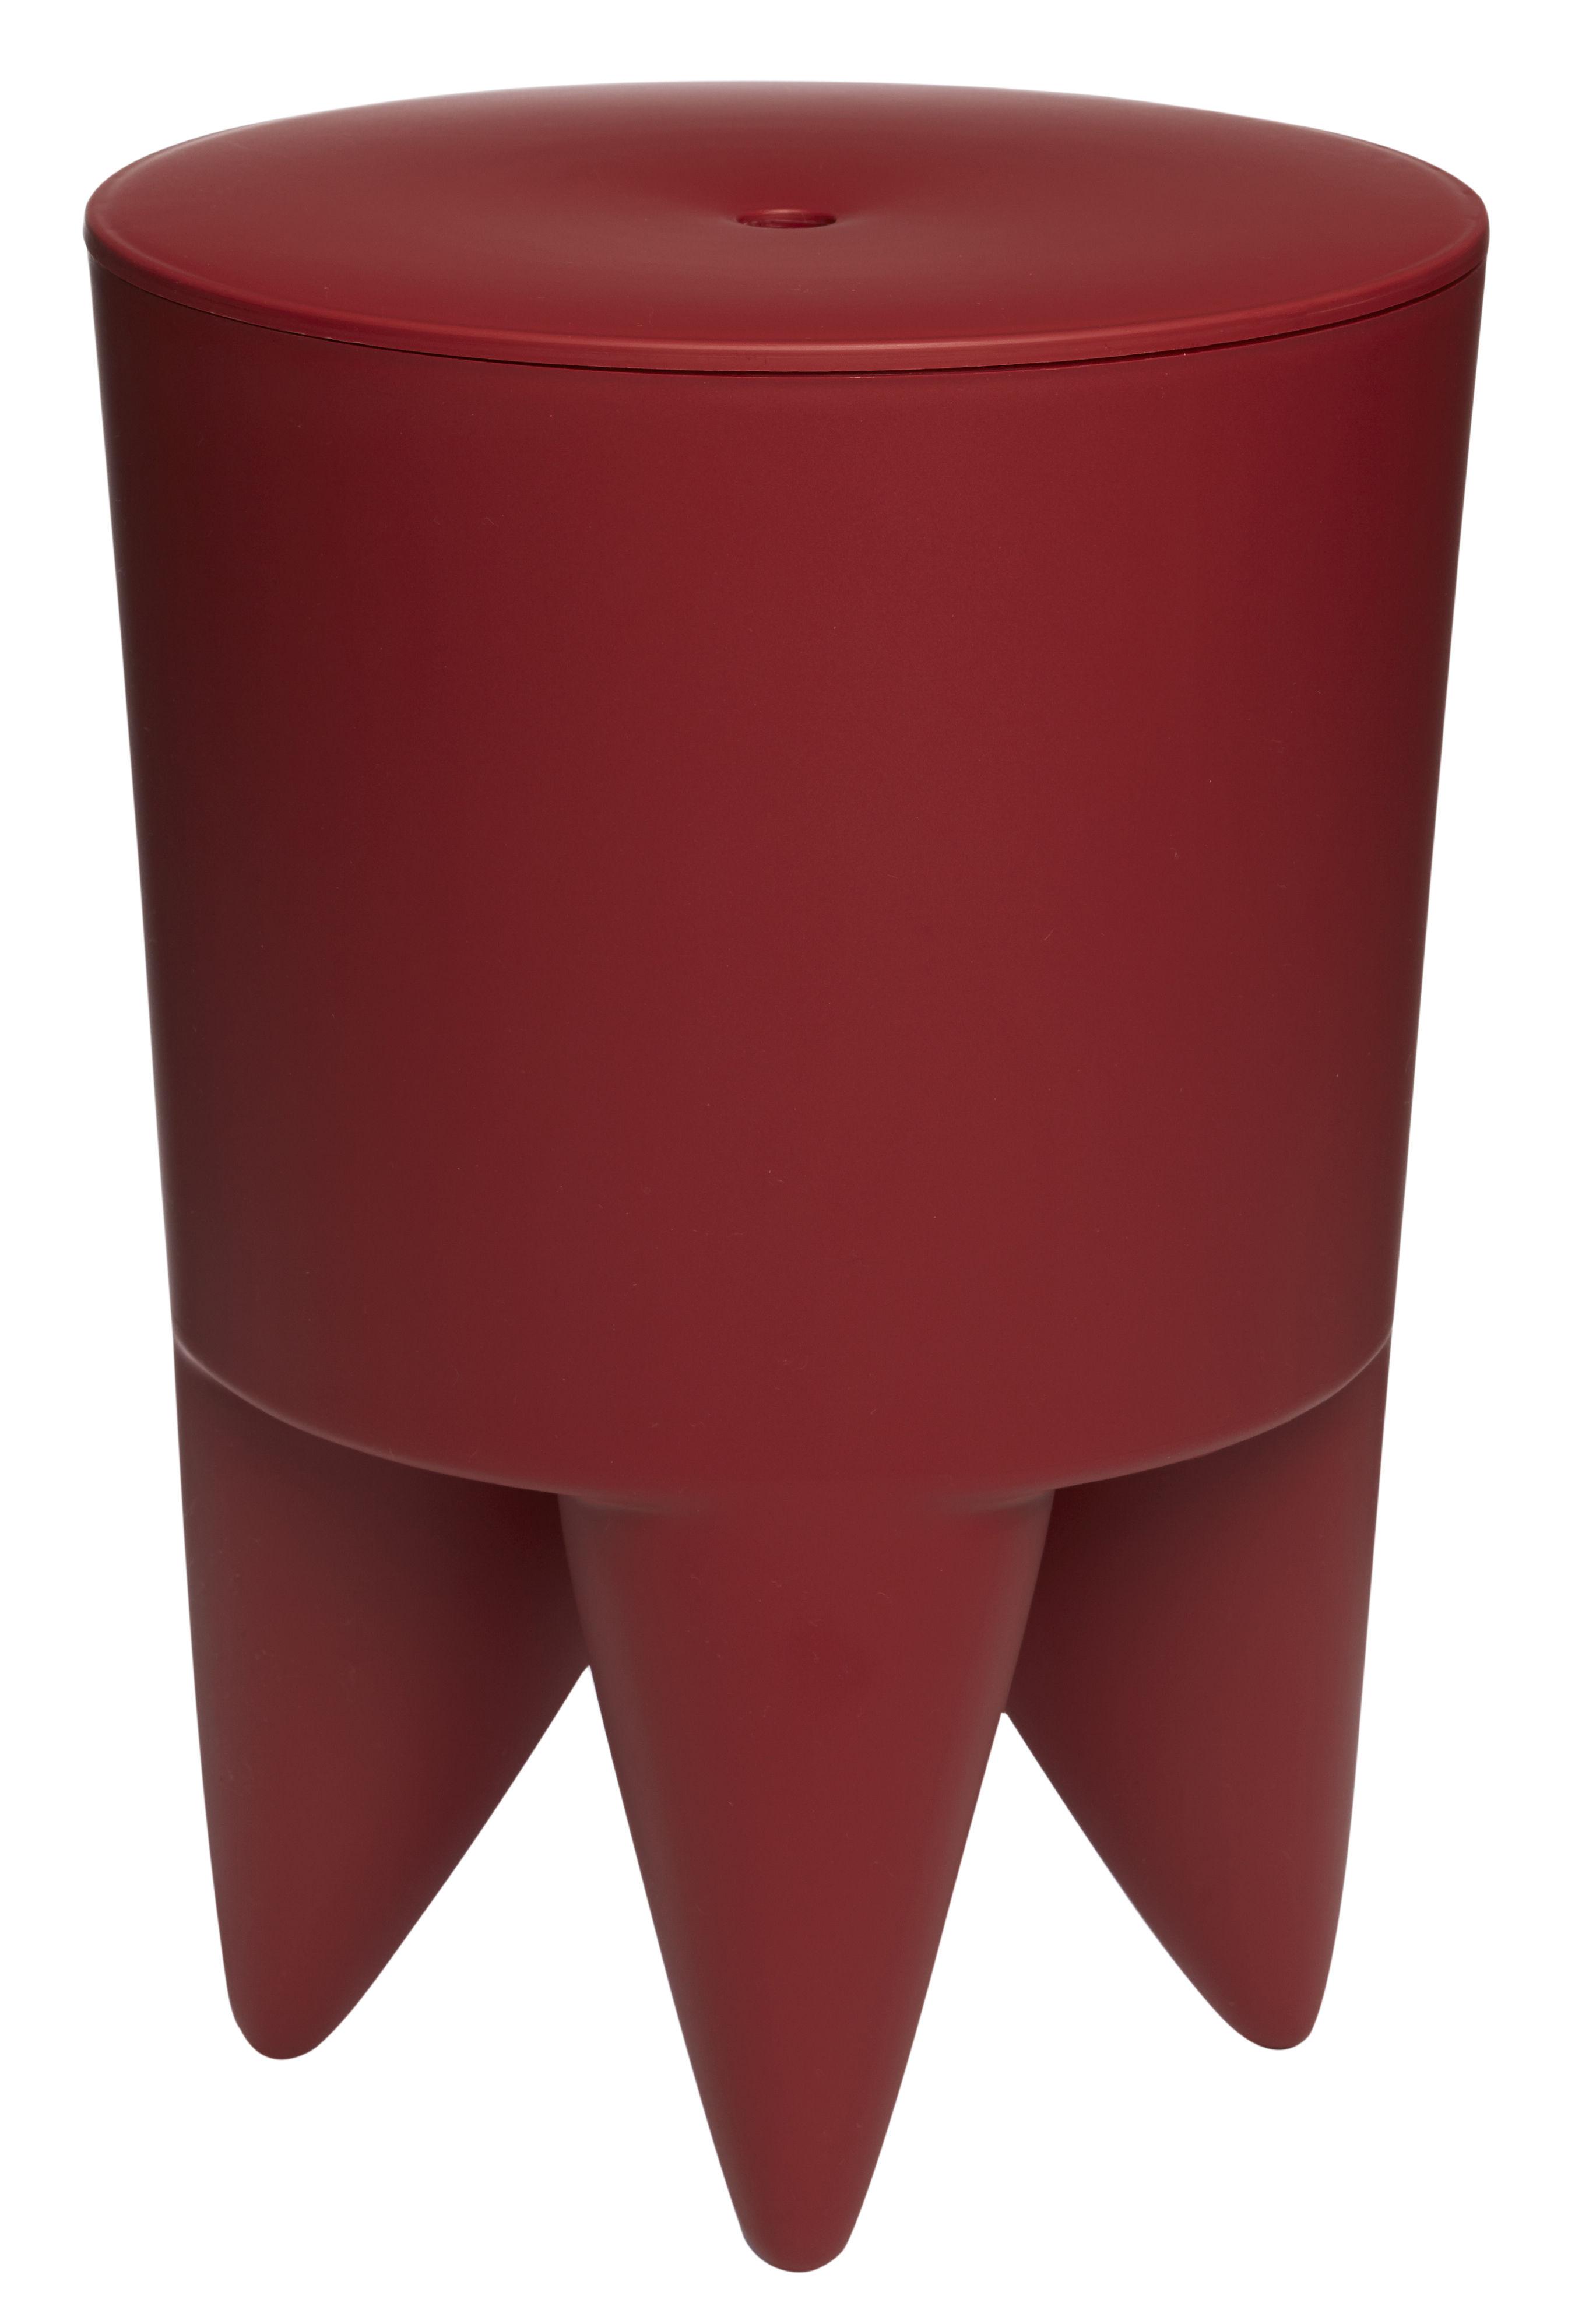 Furniture - Stools - New Bubu 1er Stool - / Box - Plastic by XO - Brown-red - Polypropylene